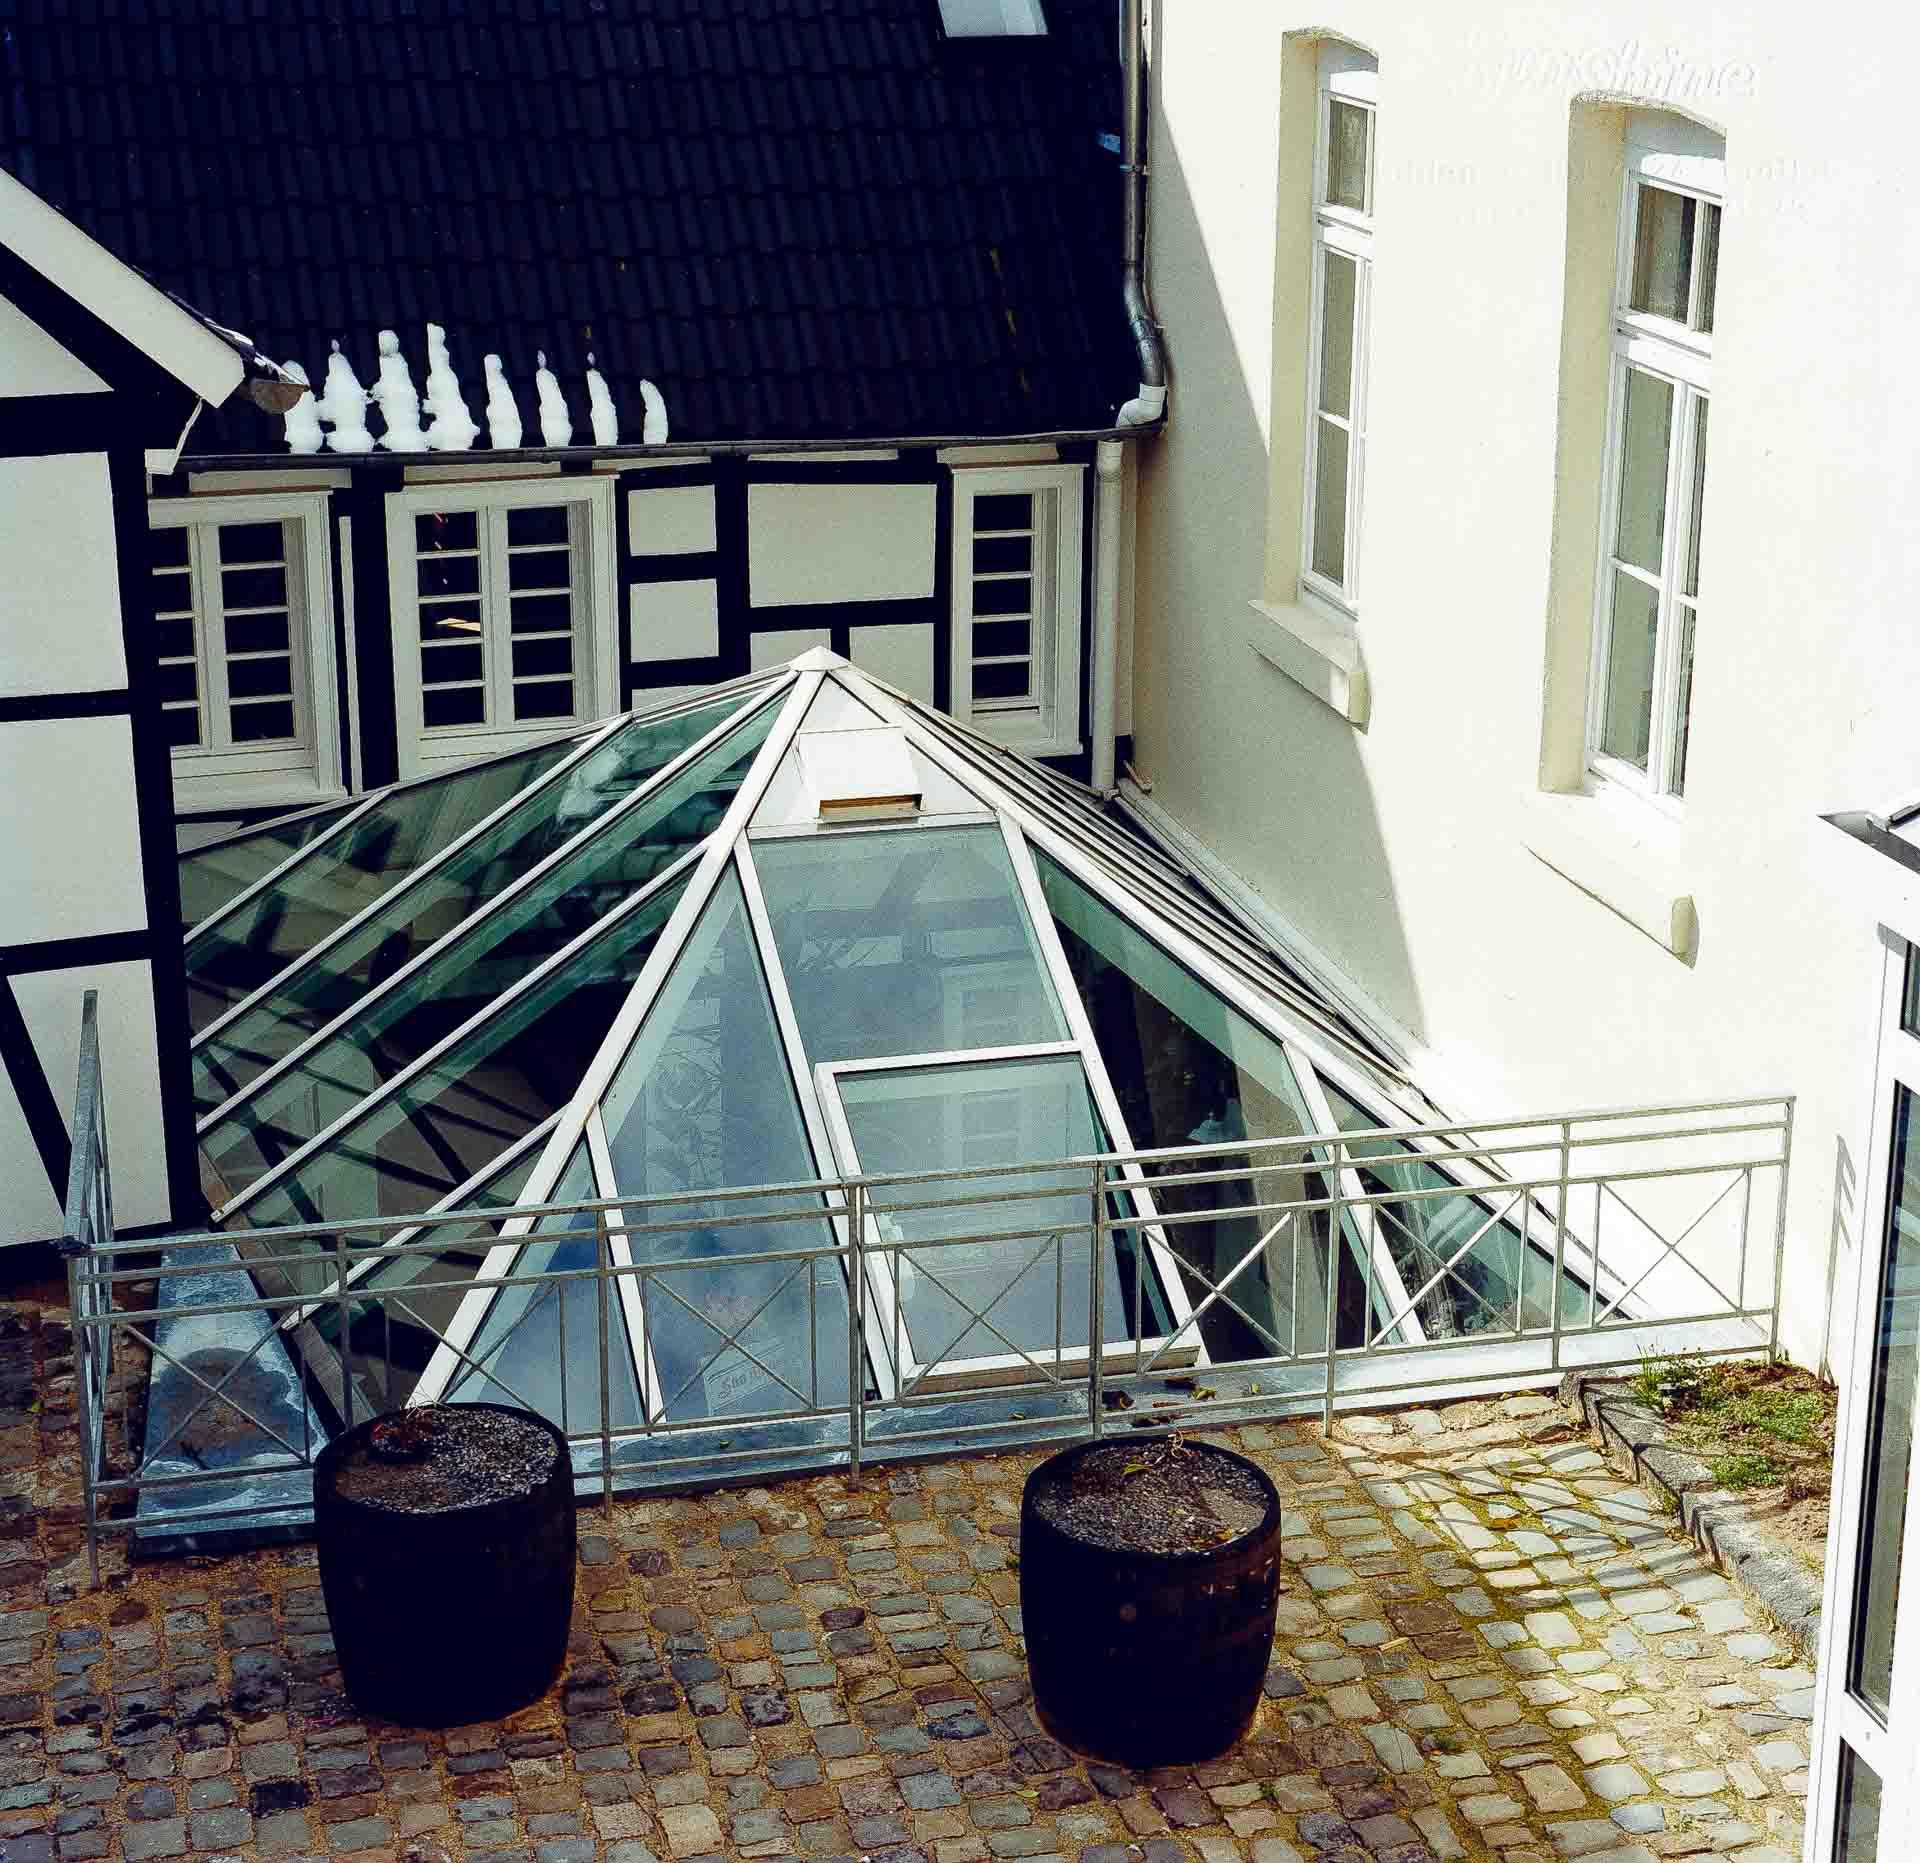 Lichtdach in Solingen (Objekt 448).